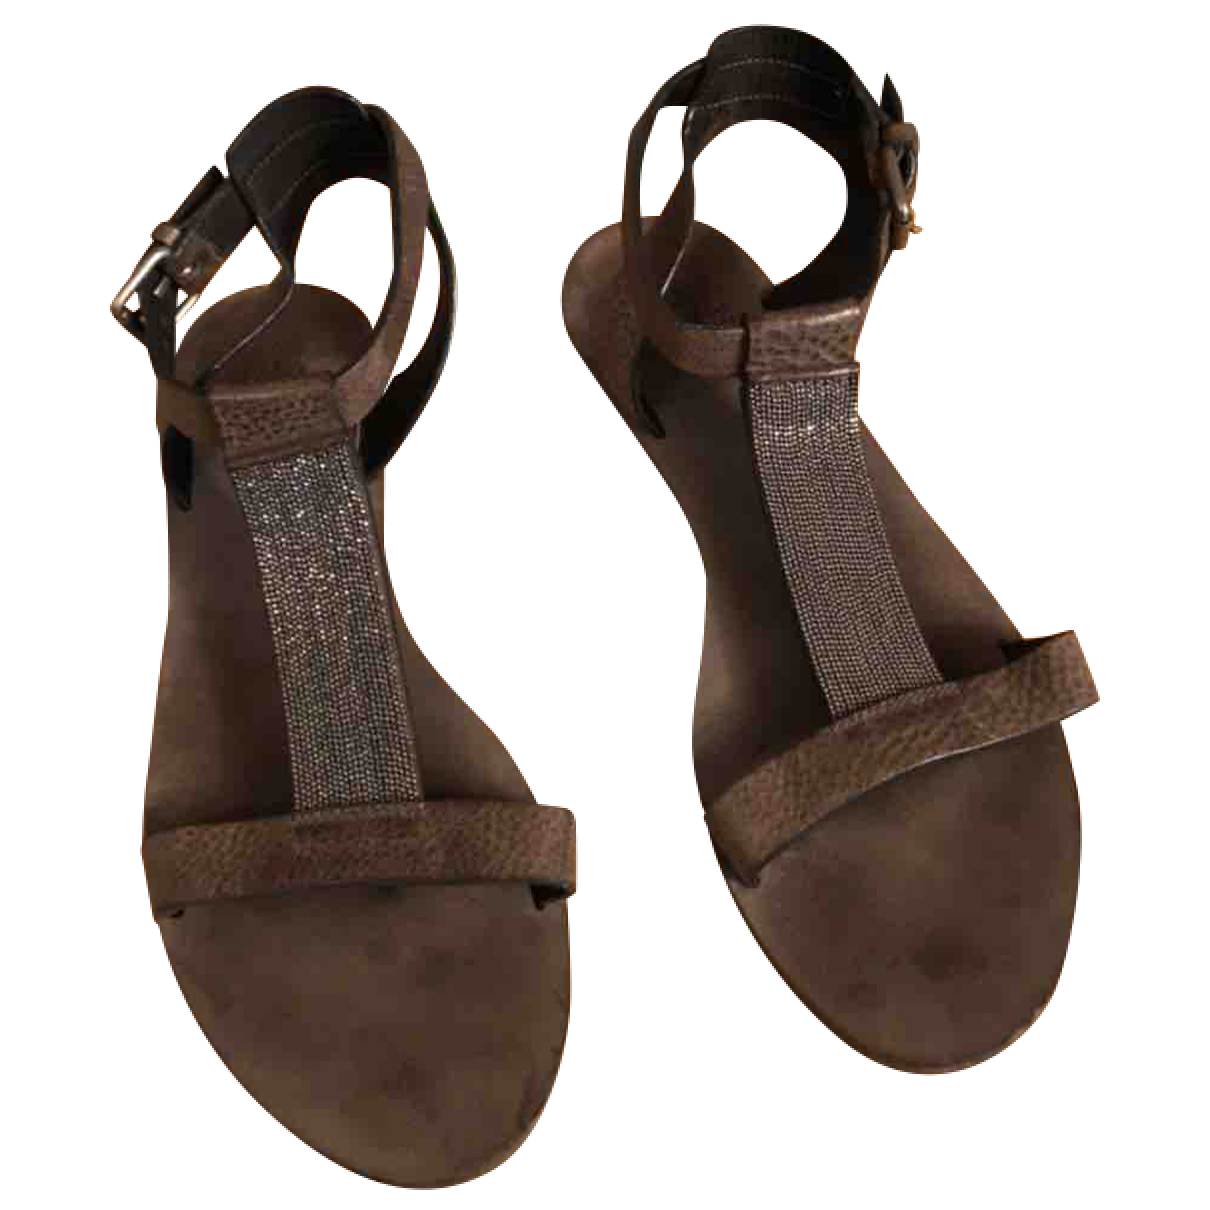 Brunello Cucinelli N Brown Leather Sandals for Women 37 EU